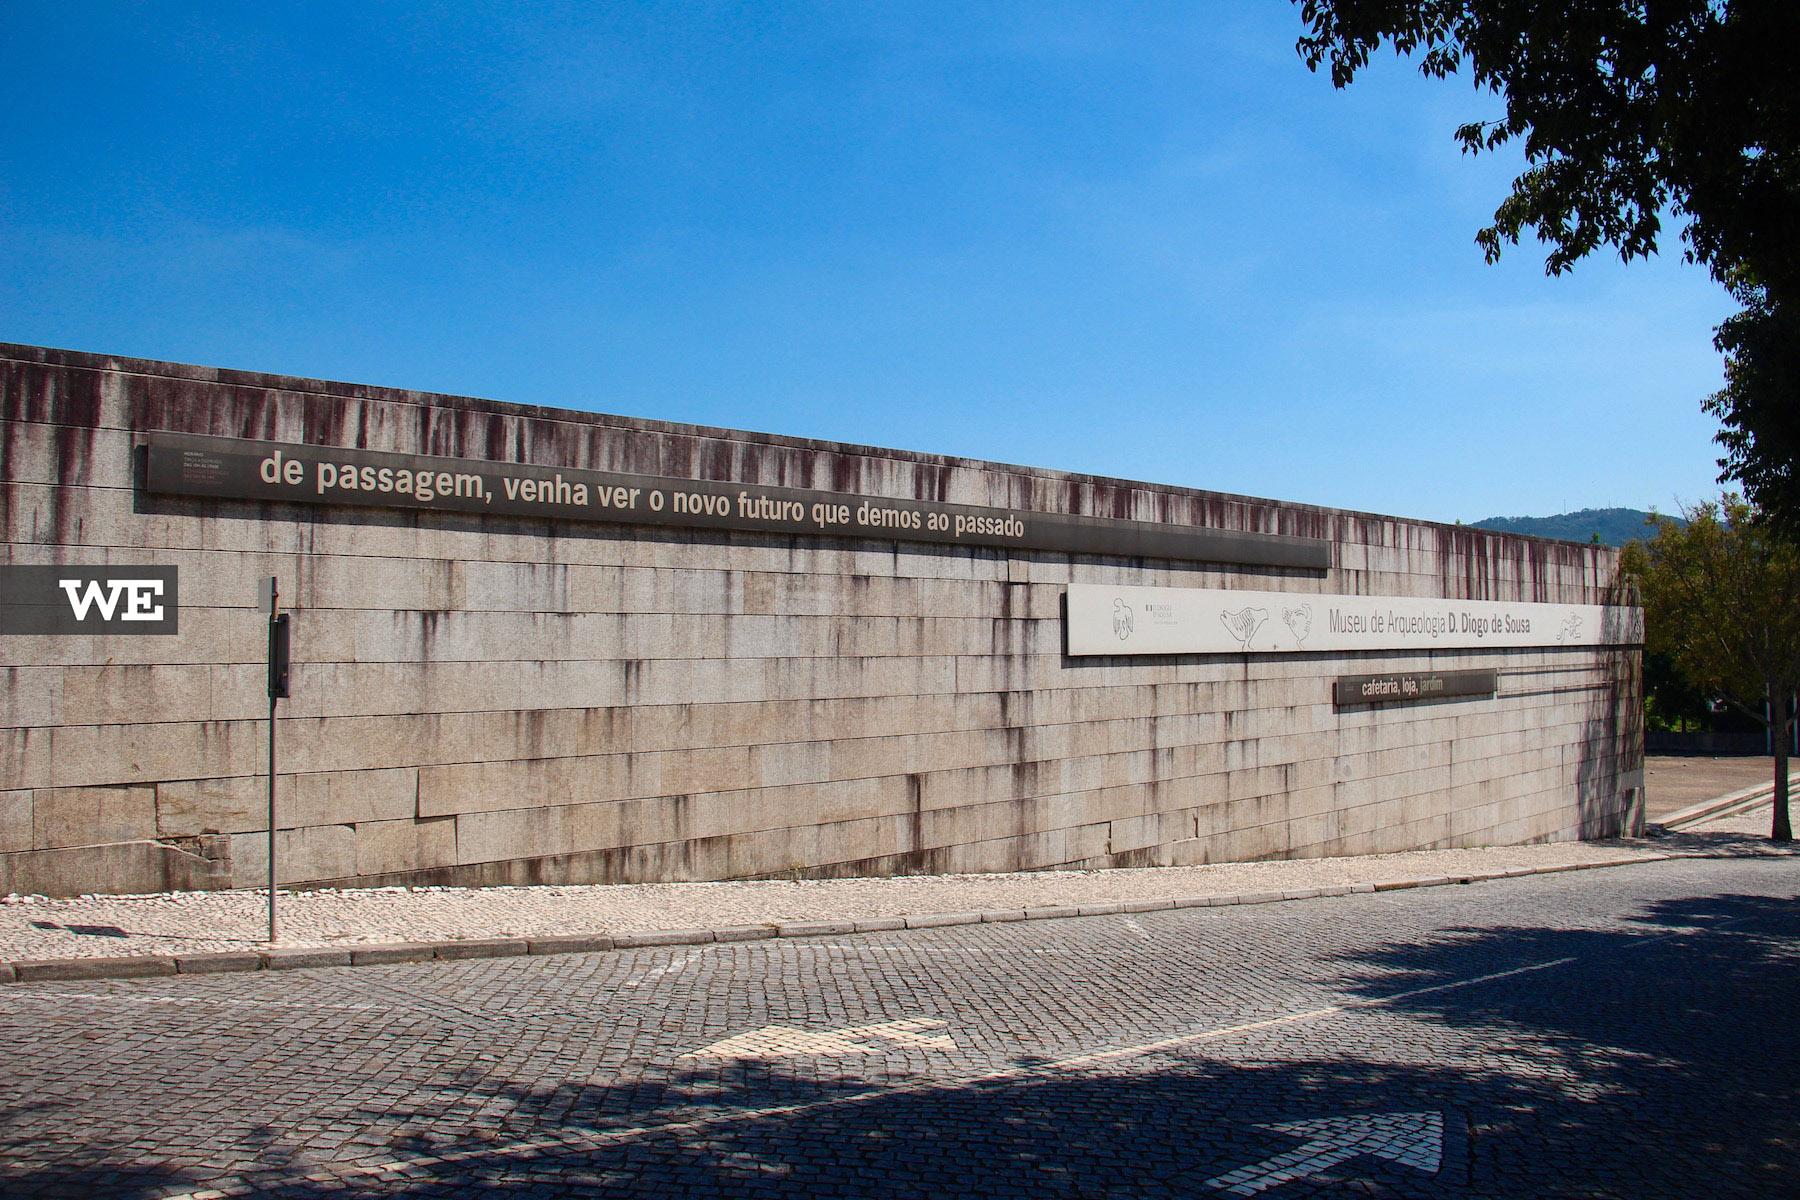 Vista de rua do Museu D. Diogo de Sousa